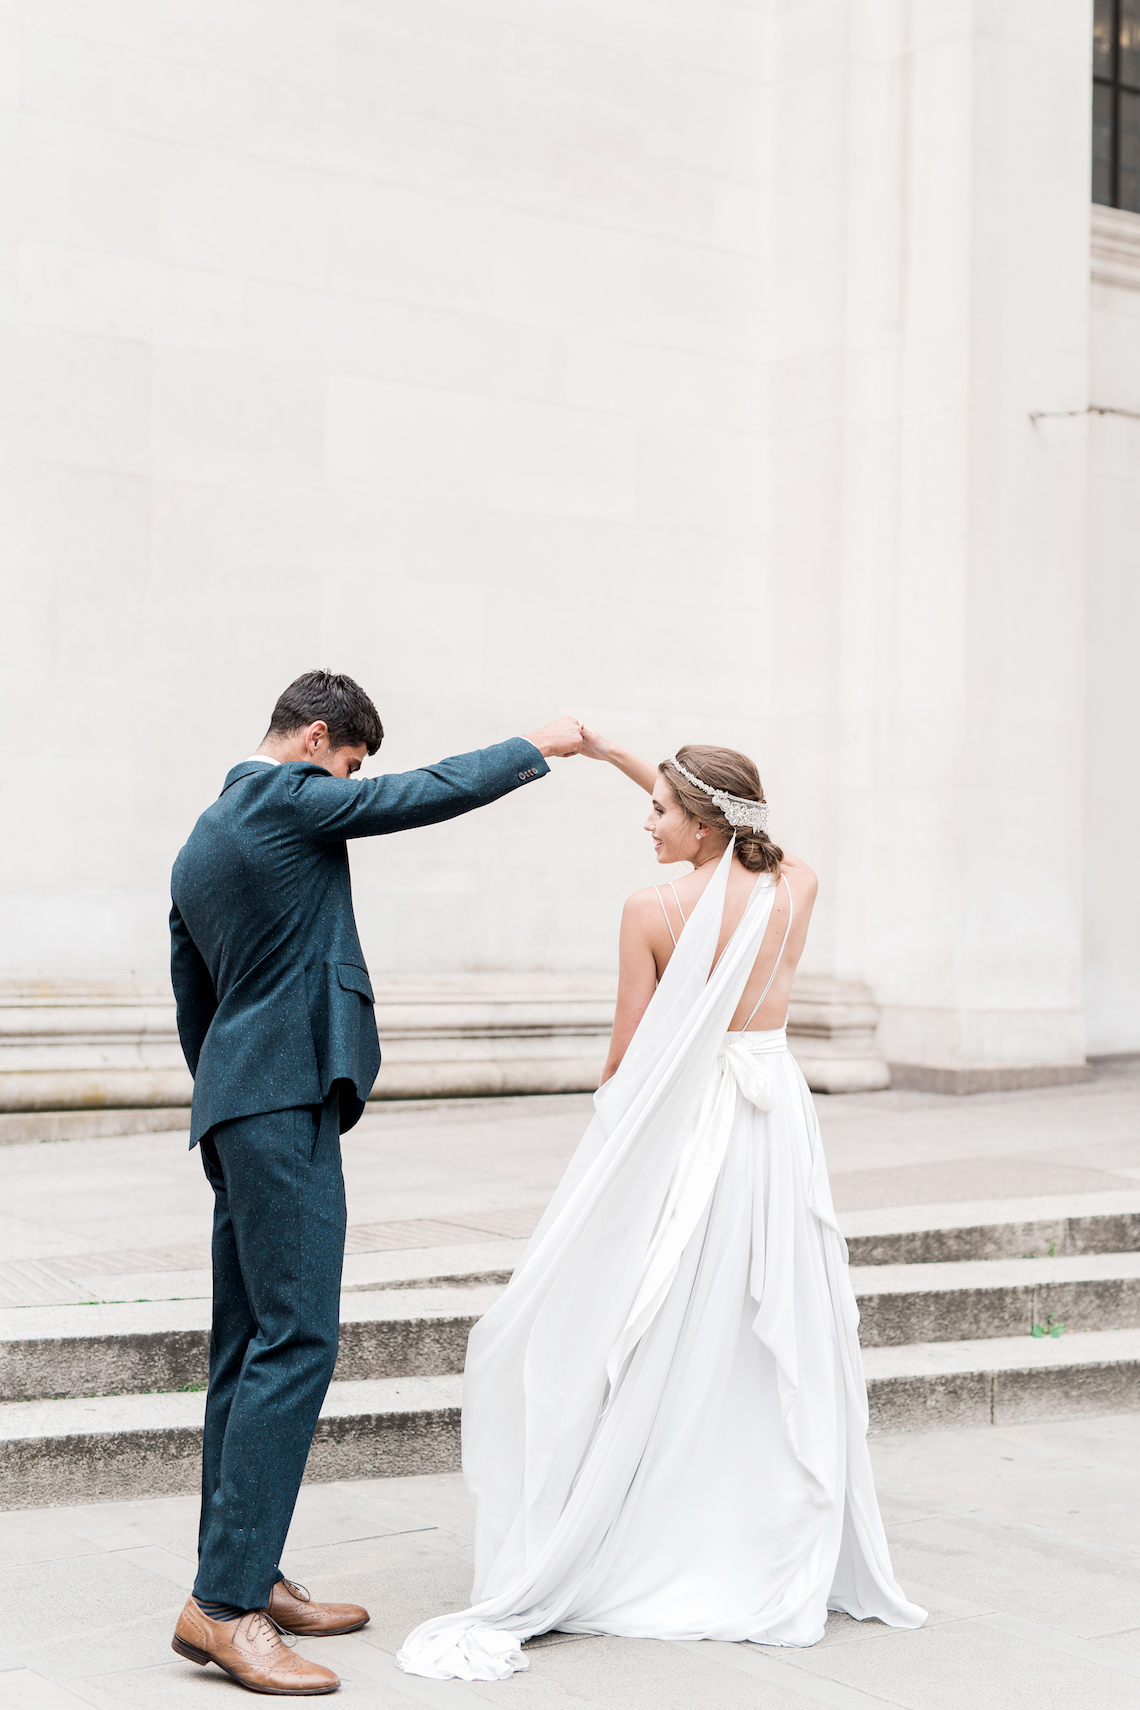 Soft & Dreamy Bridal Fashion Inspiration | Emma Pilkington 30